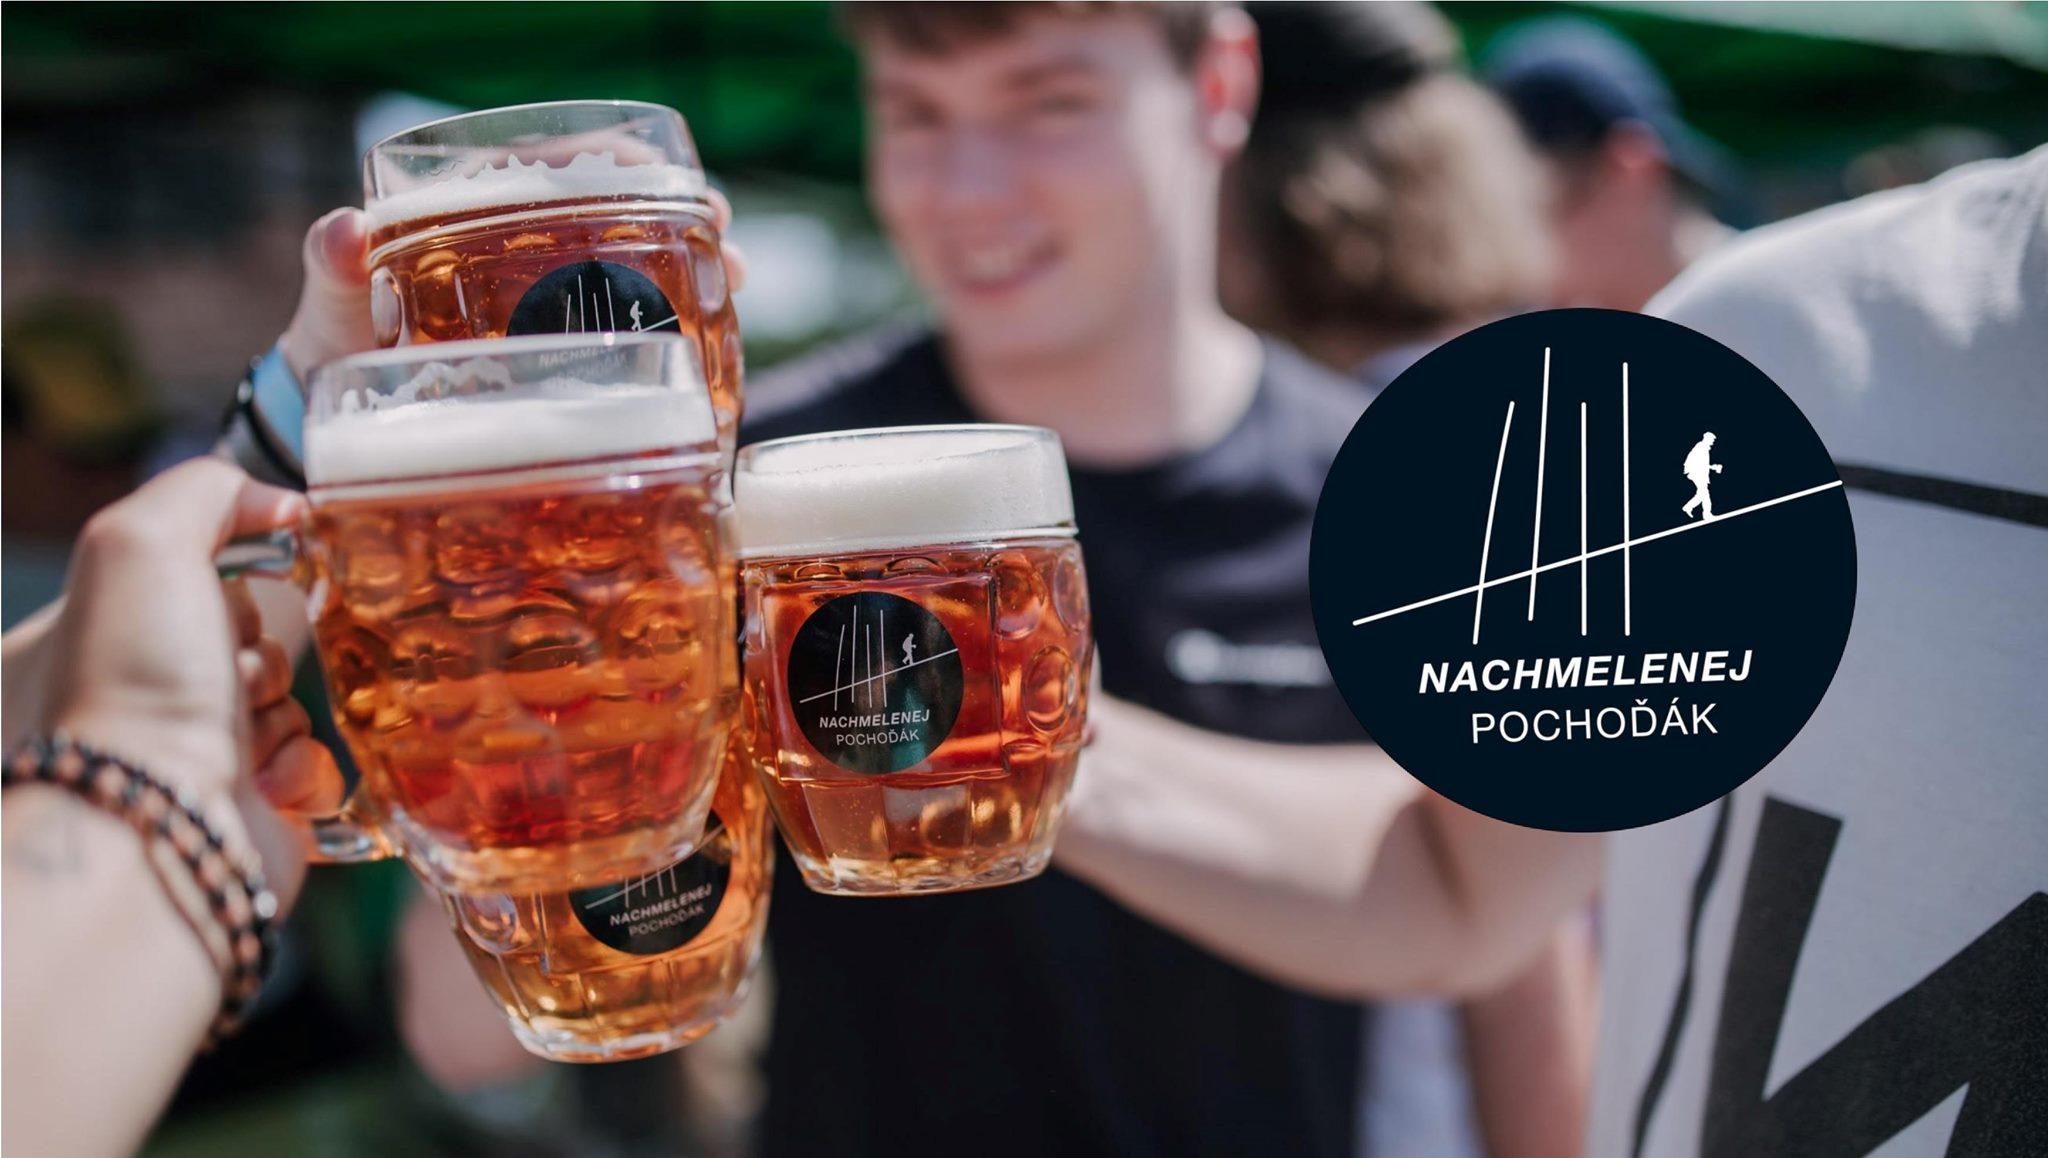 pivovary-pivni-akce-nachmelenej-pochodak-bila-tremesna-2020